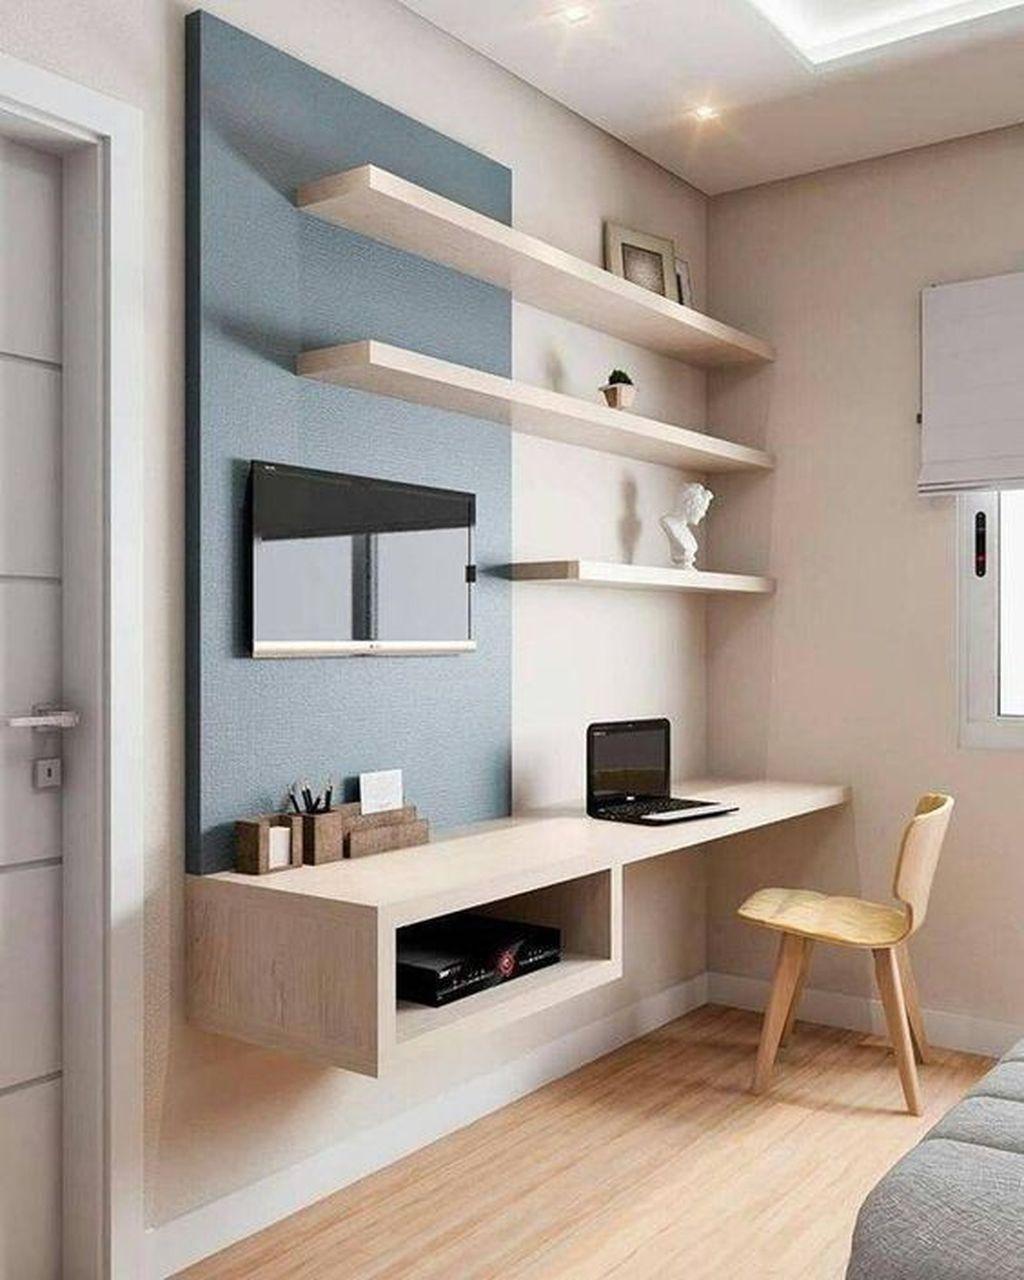 50 Inspiring Home Office Design Ideas Guest Room Office Home